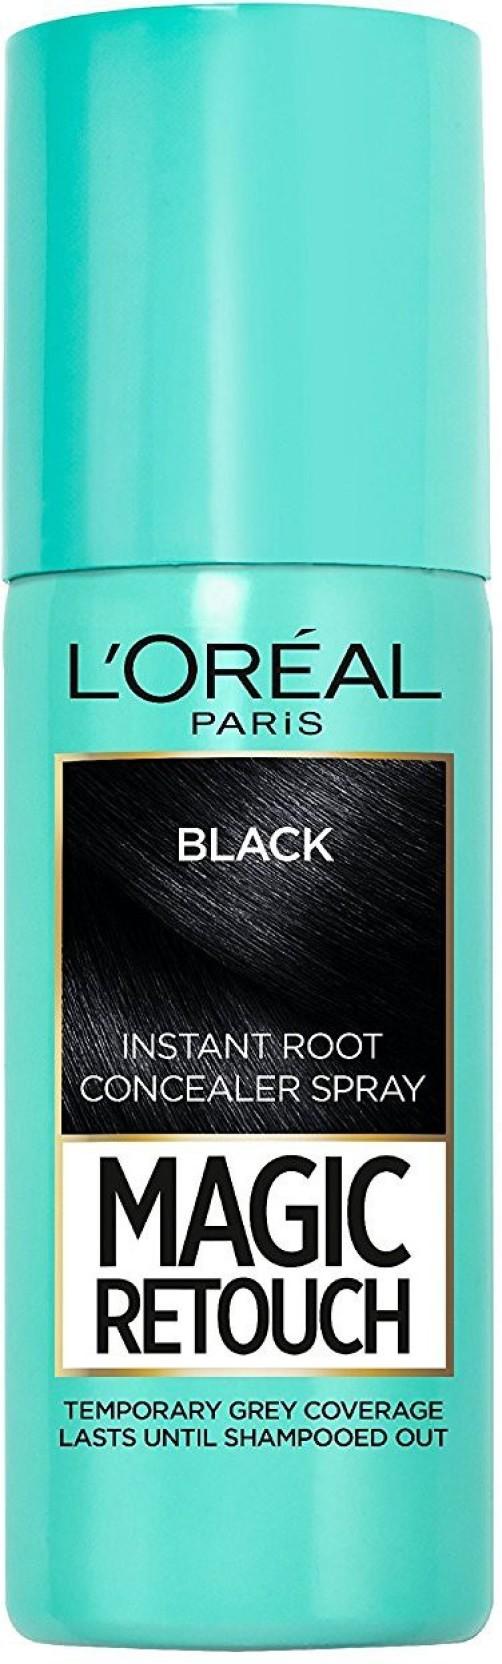 a964f0585d760 L'Oreal Paris Magic Retouch, Black, 75ml Instant Root Concealer ...